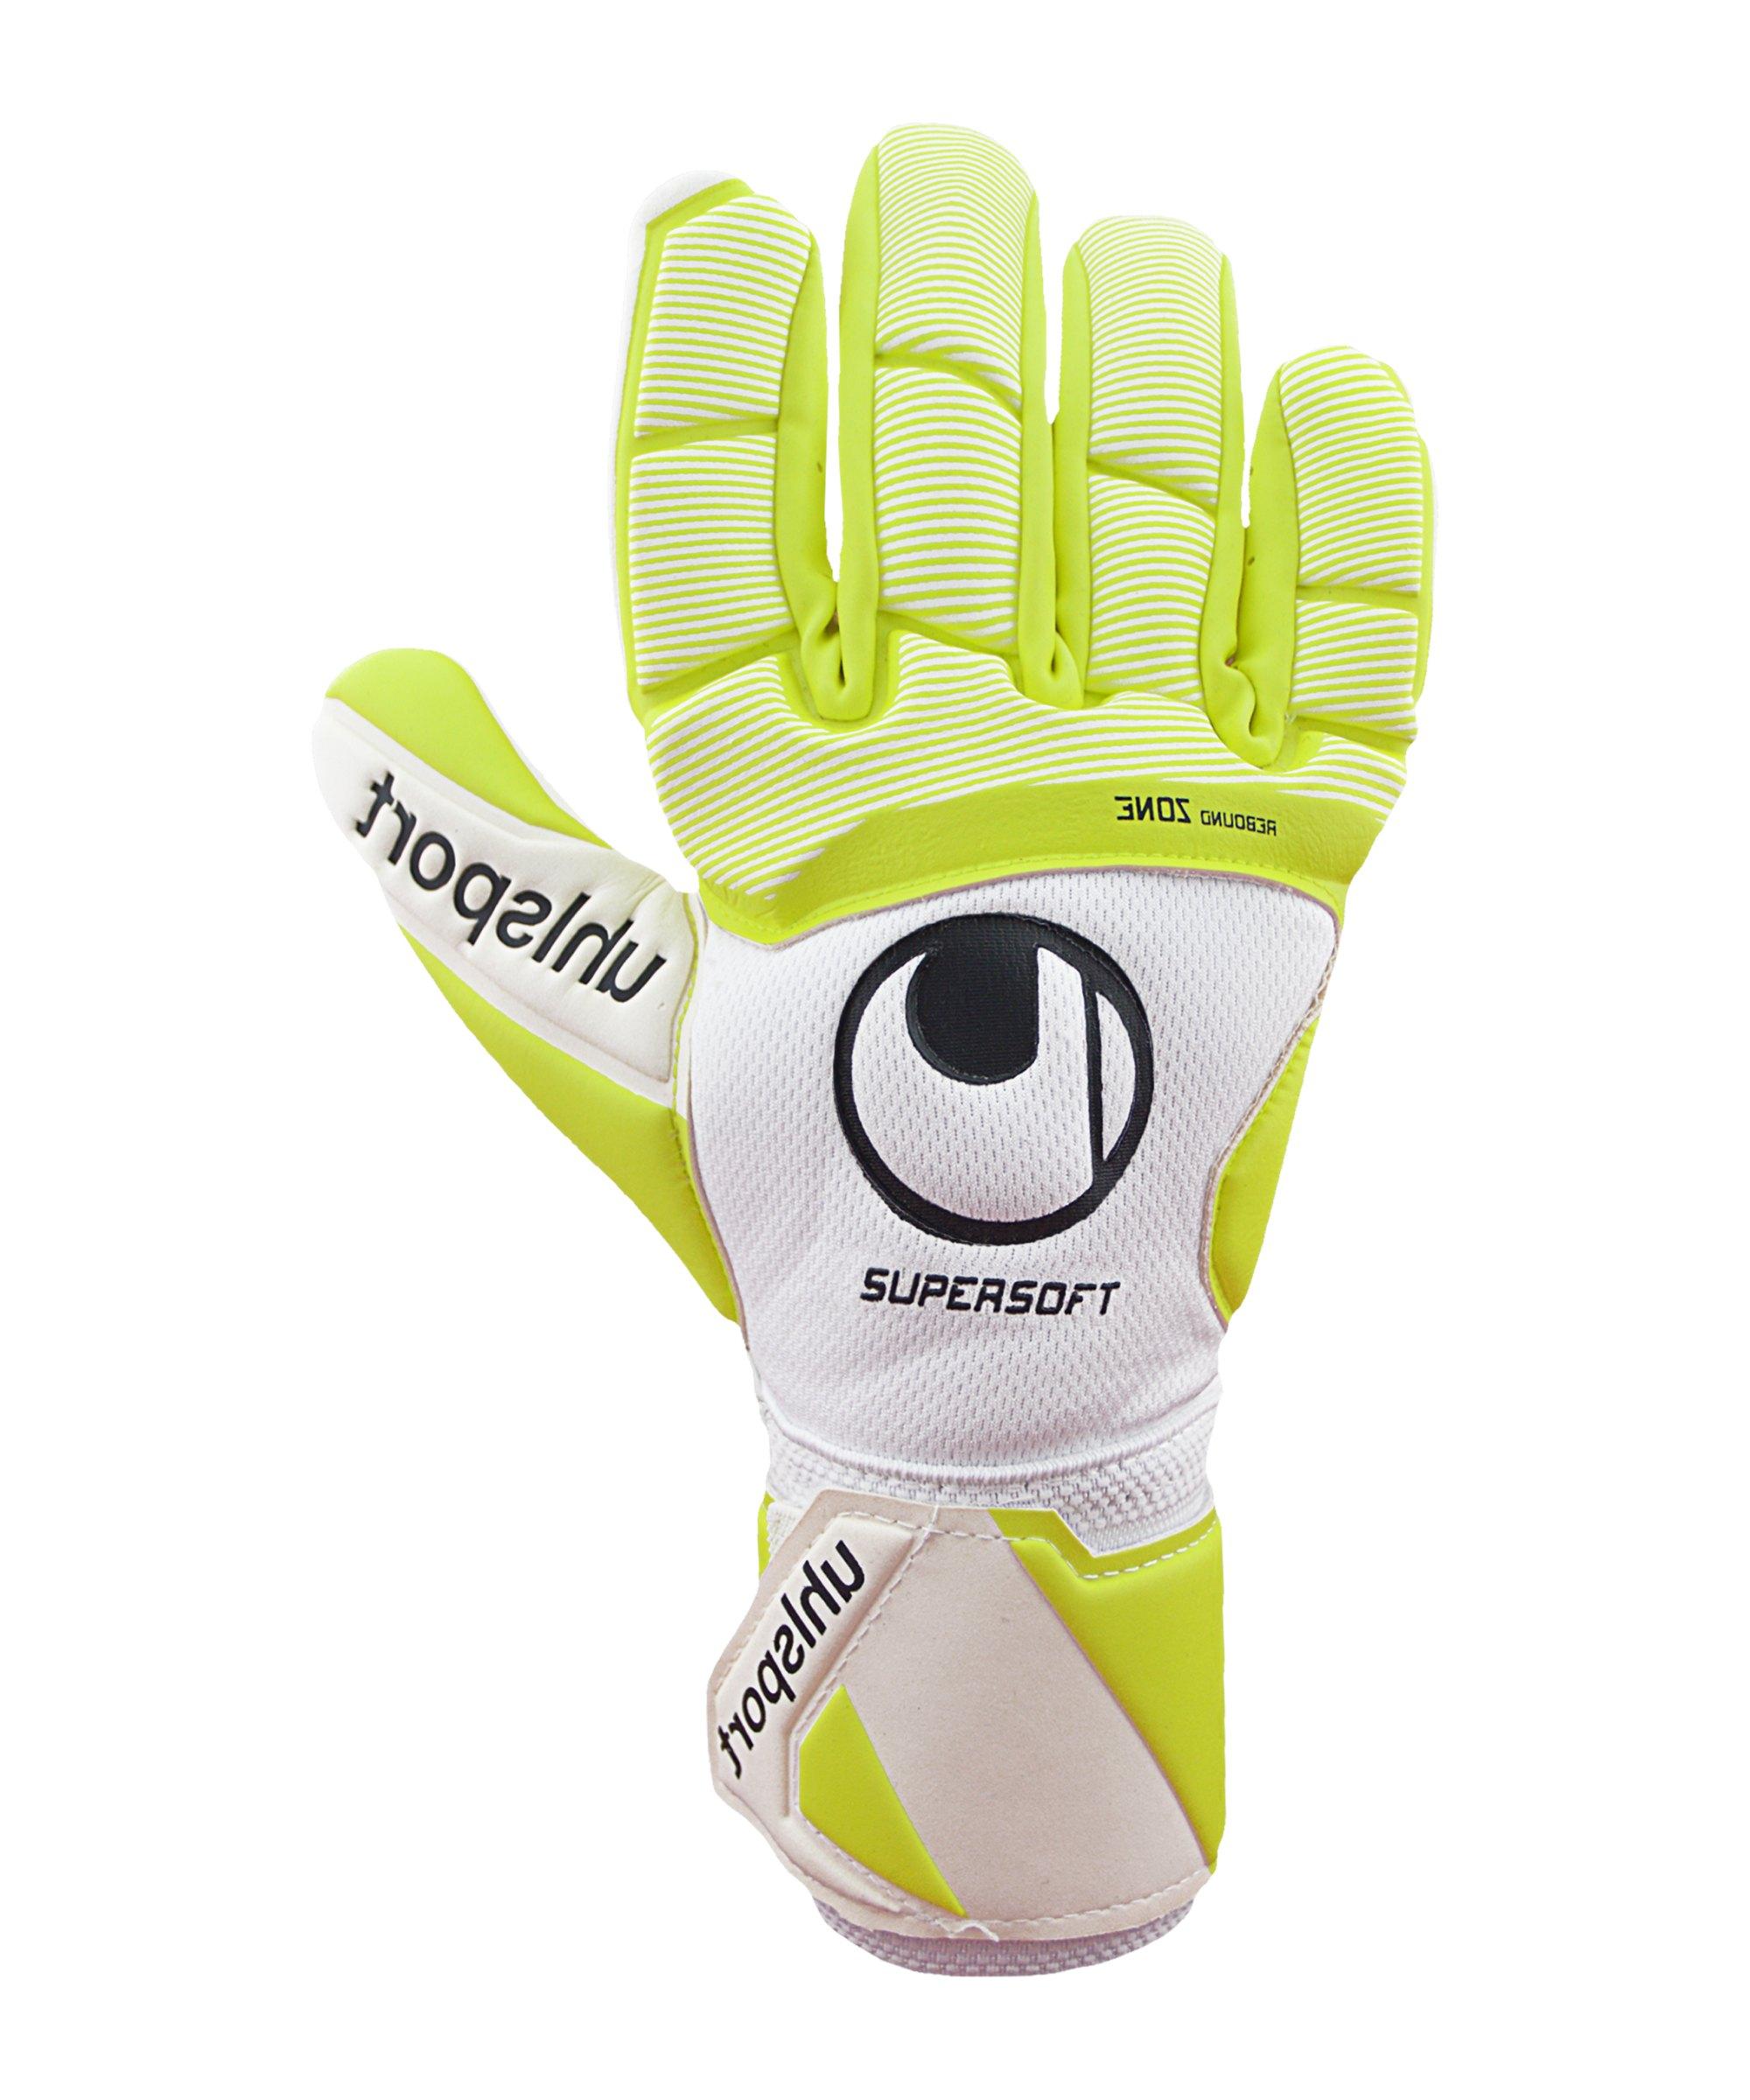 Uhlsport Pure Alliance Supersoft HN TW-Handschuh F01 - weiss